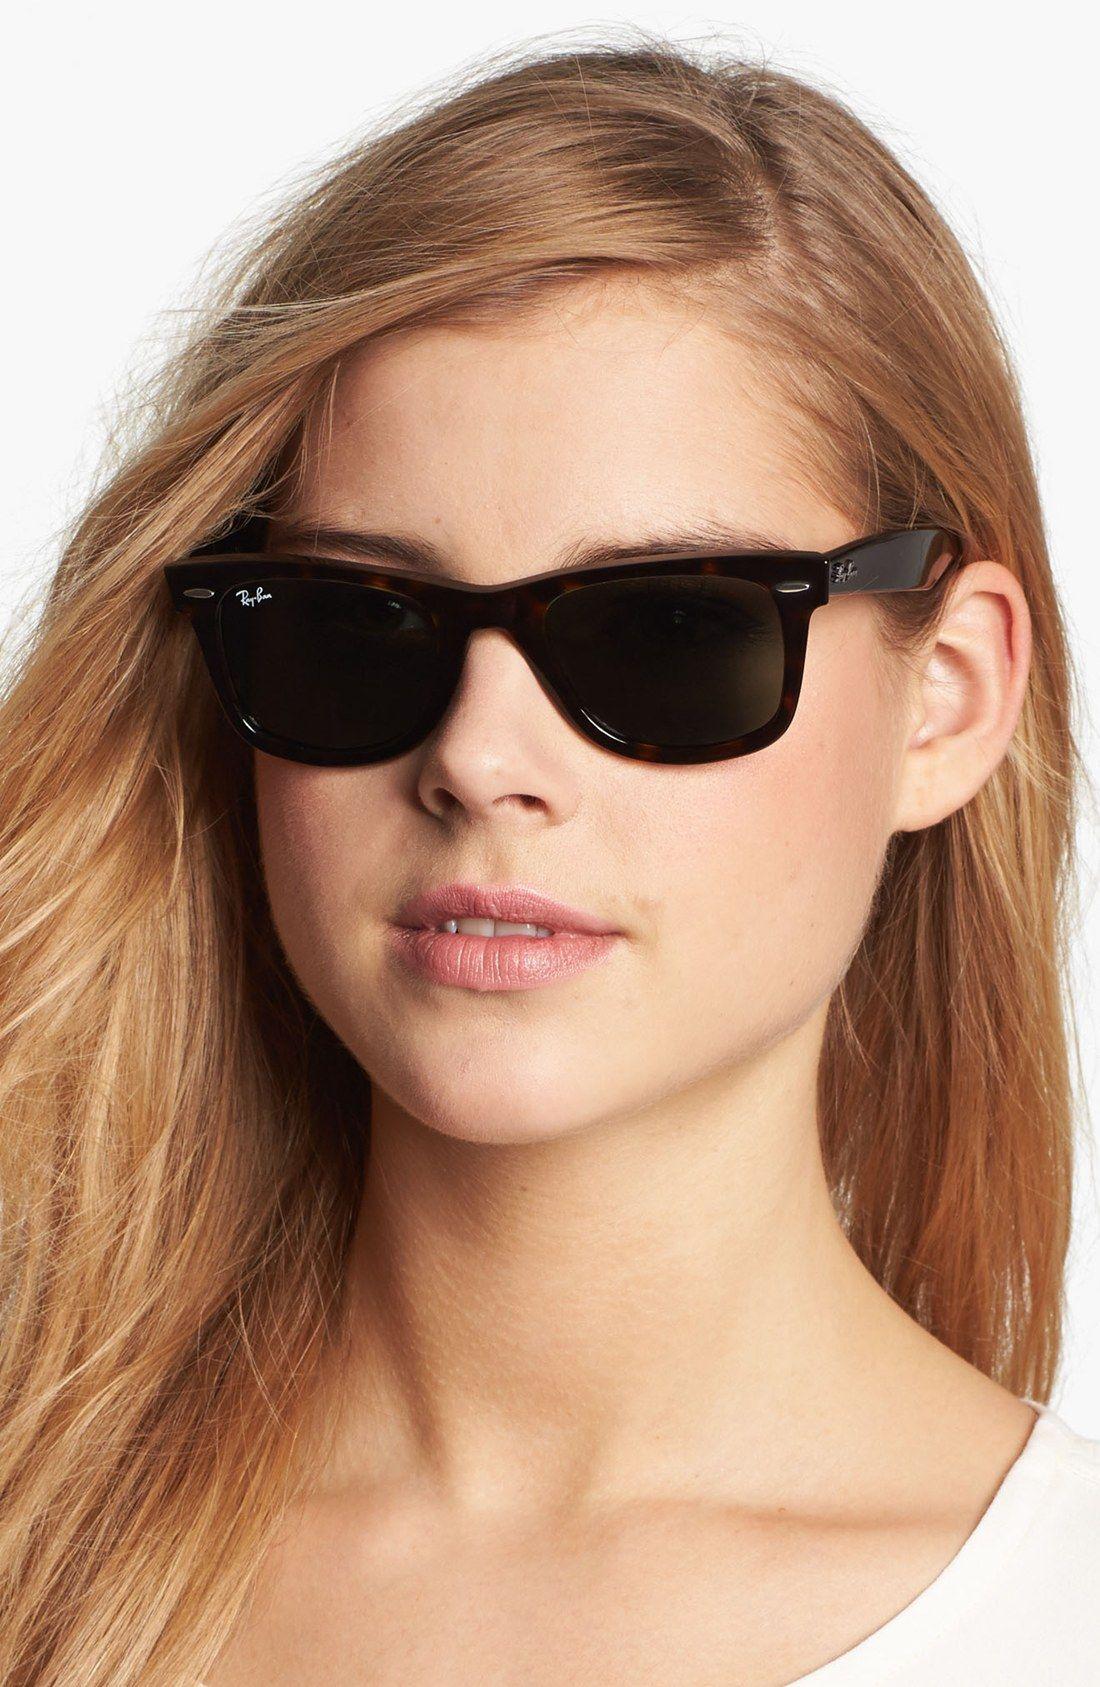 1e0a12ebe12ceb Ray-Ban  Classic Wayfarer  50mm Sunglasses   Jewelry, Shoes, and Purses